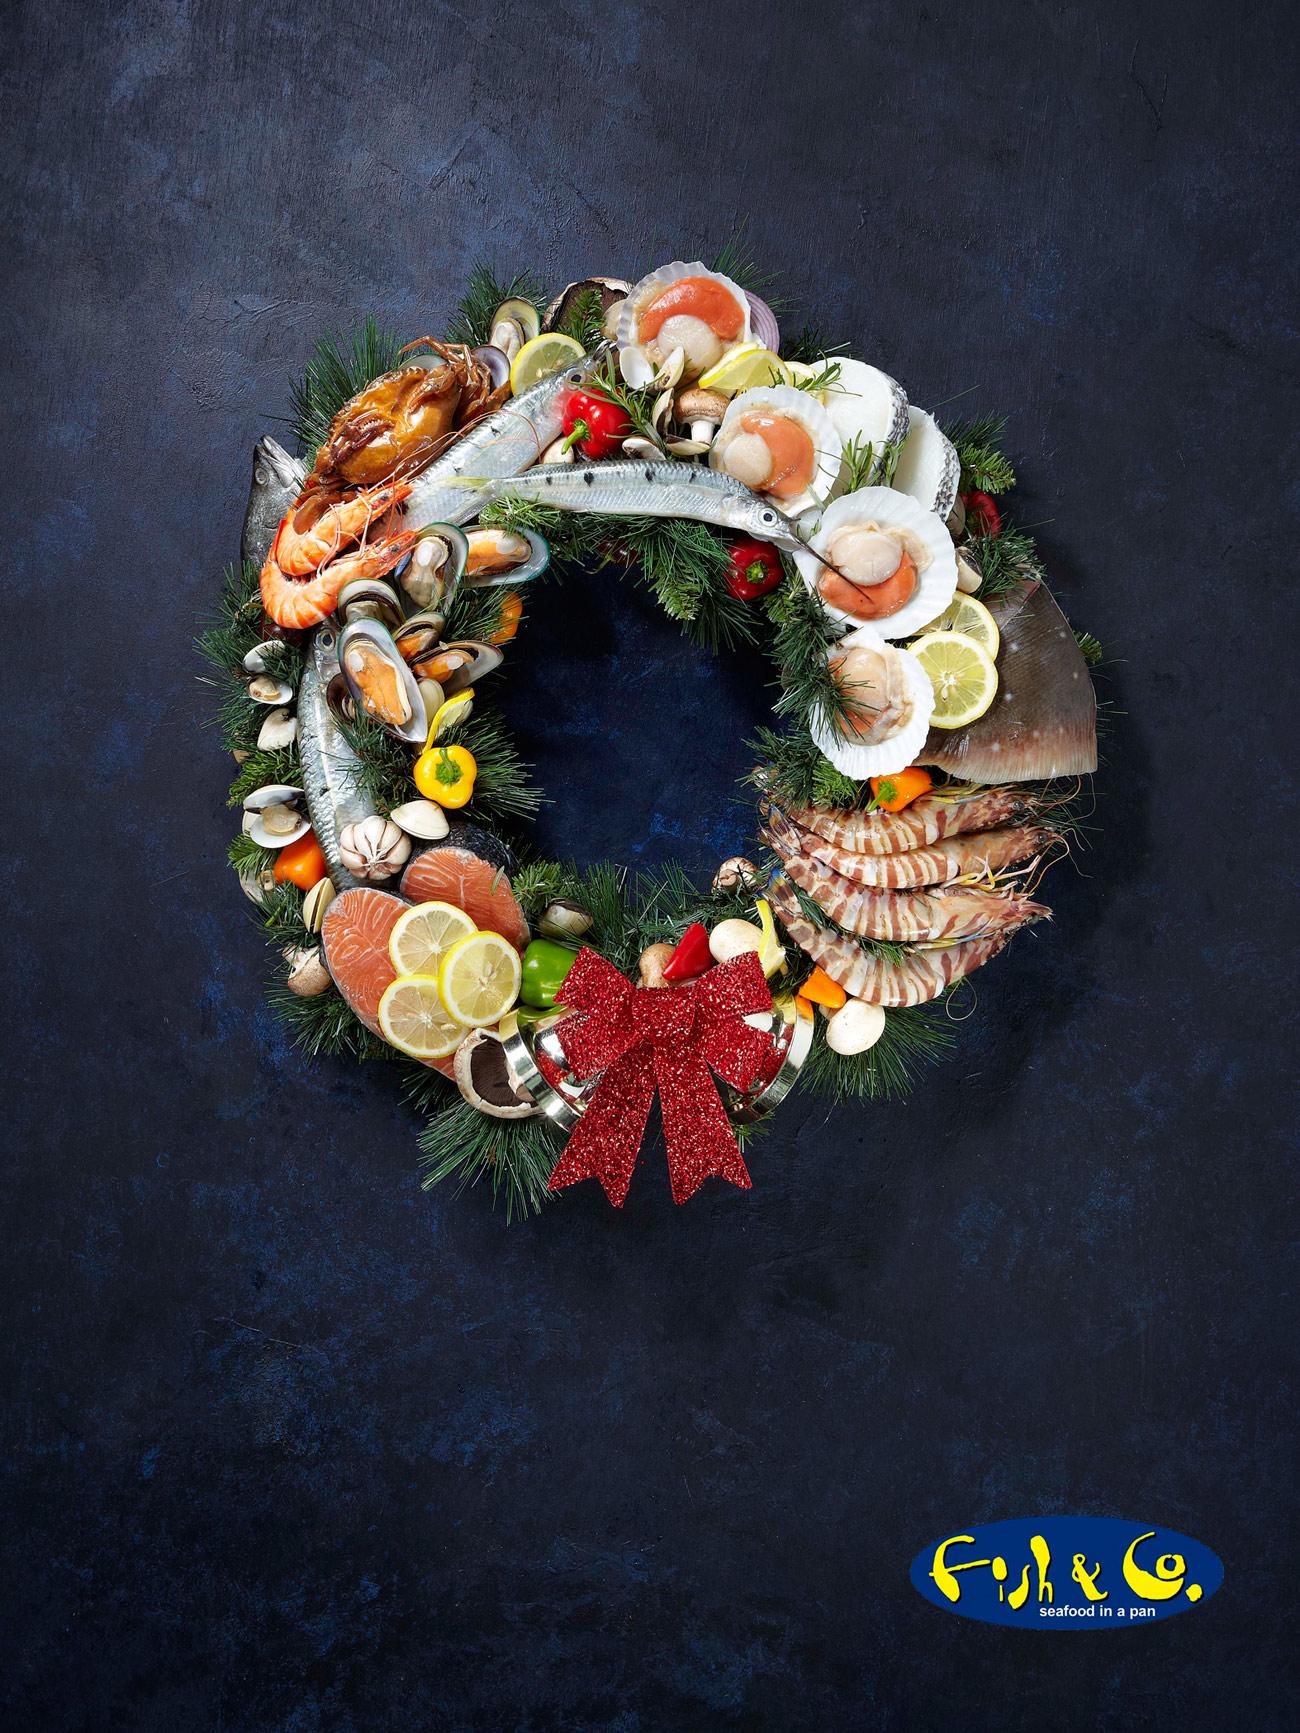 20151002-Fish&CO-Christmas-14845-with-logo.jpg